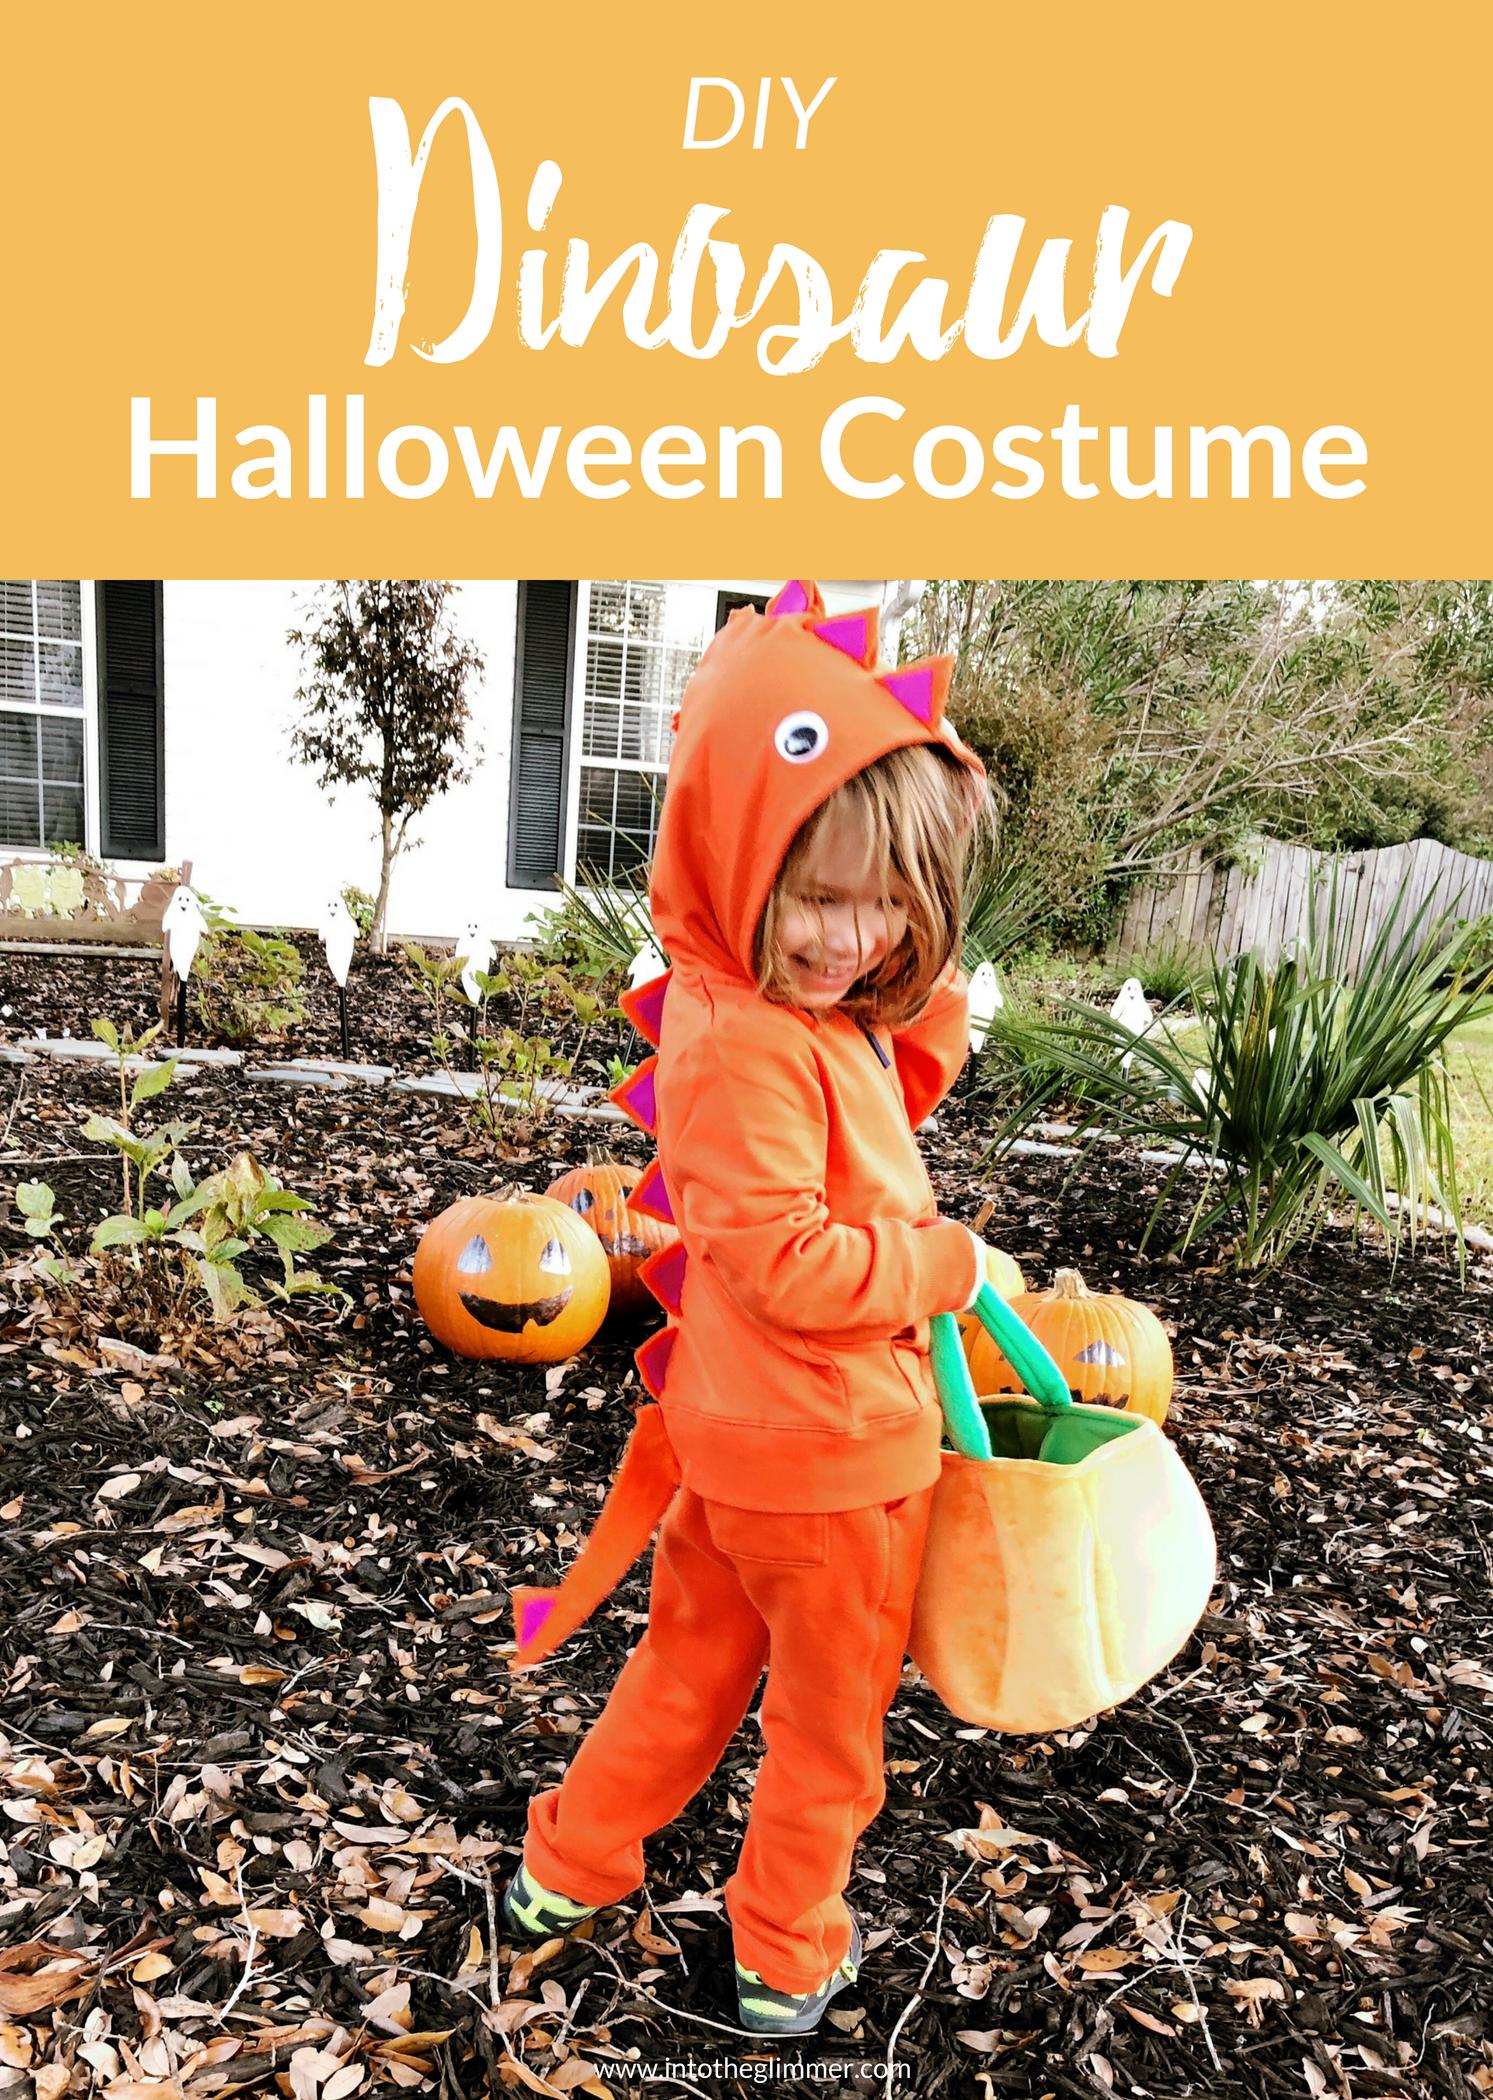 diy dinosaur halloween costume #halloween #diy